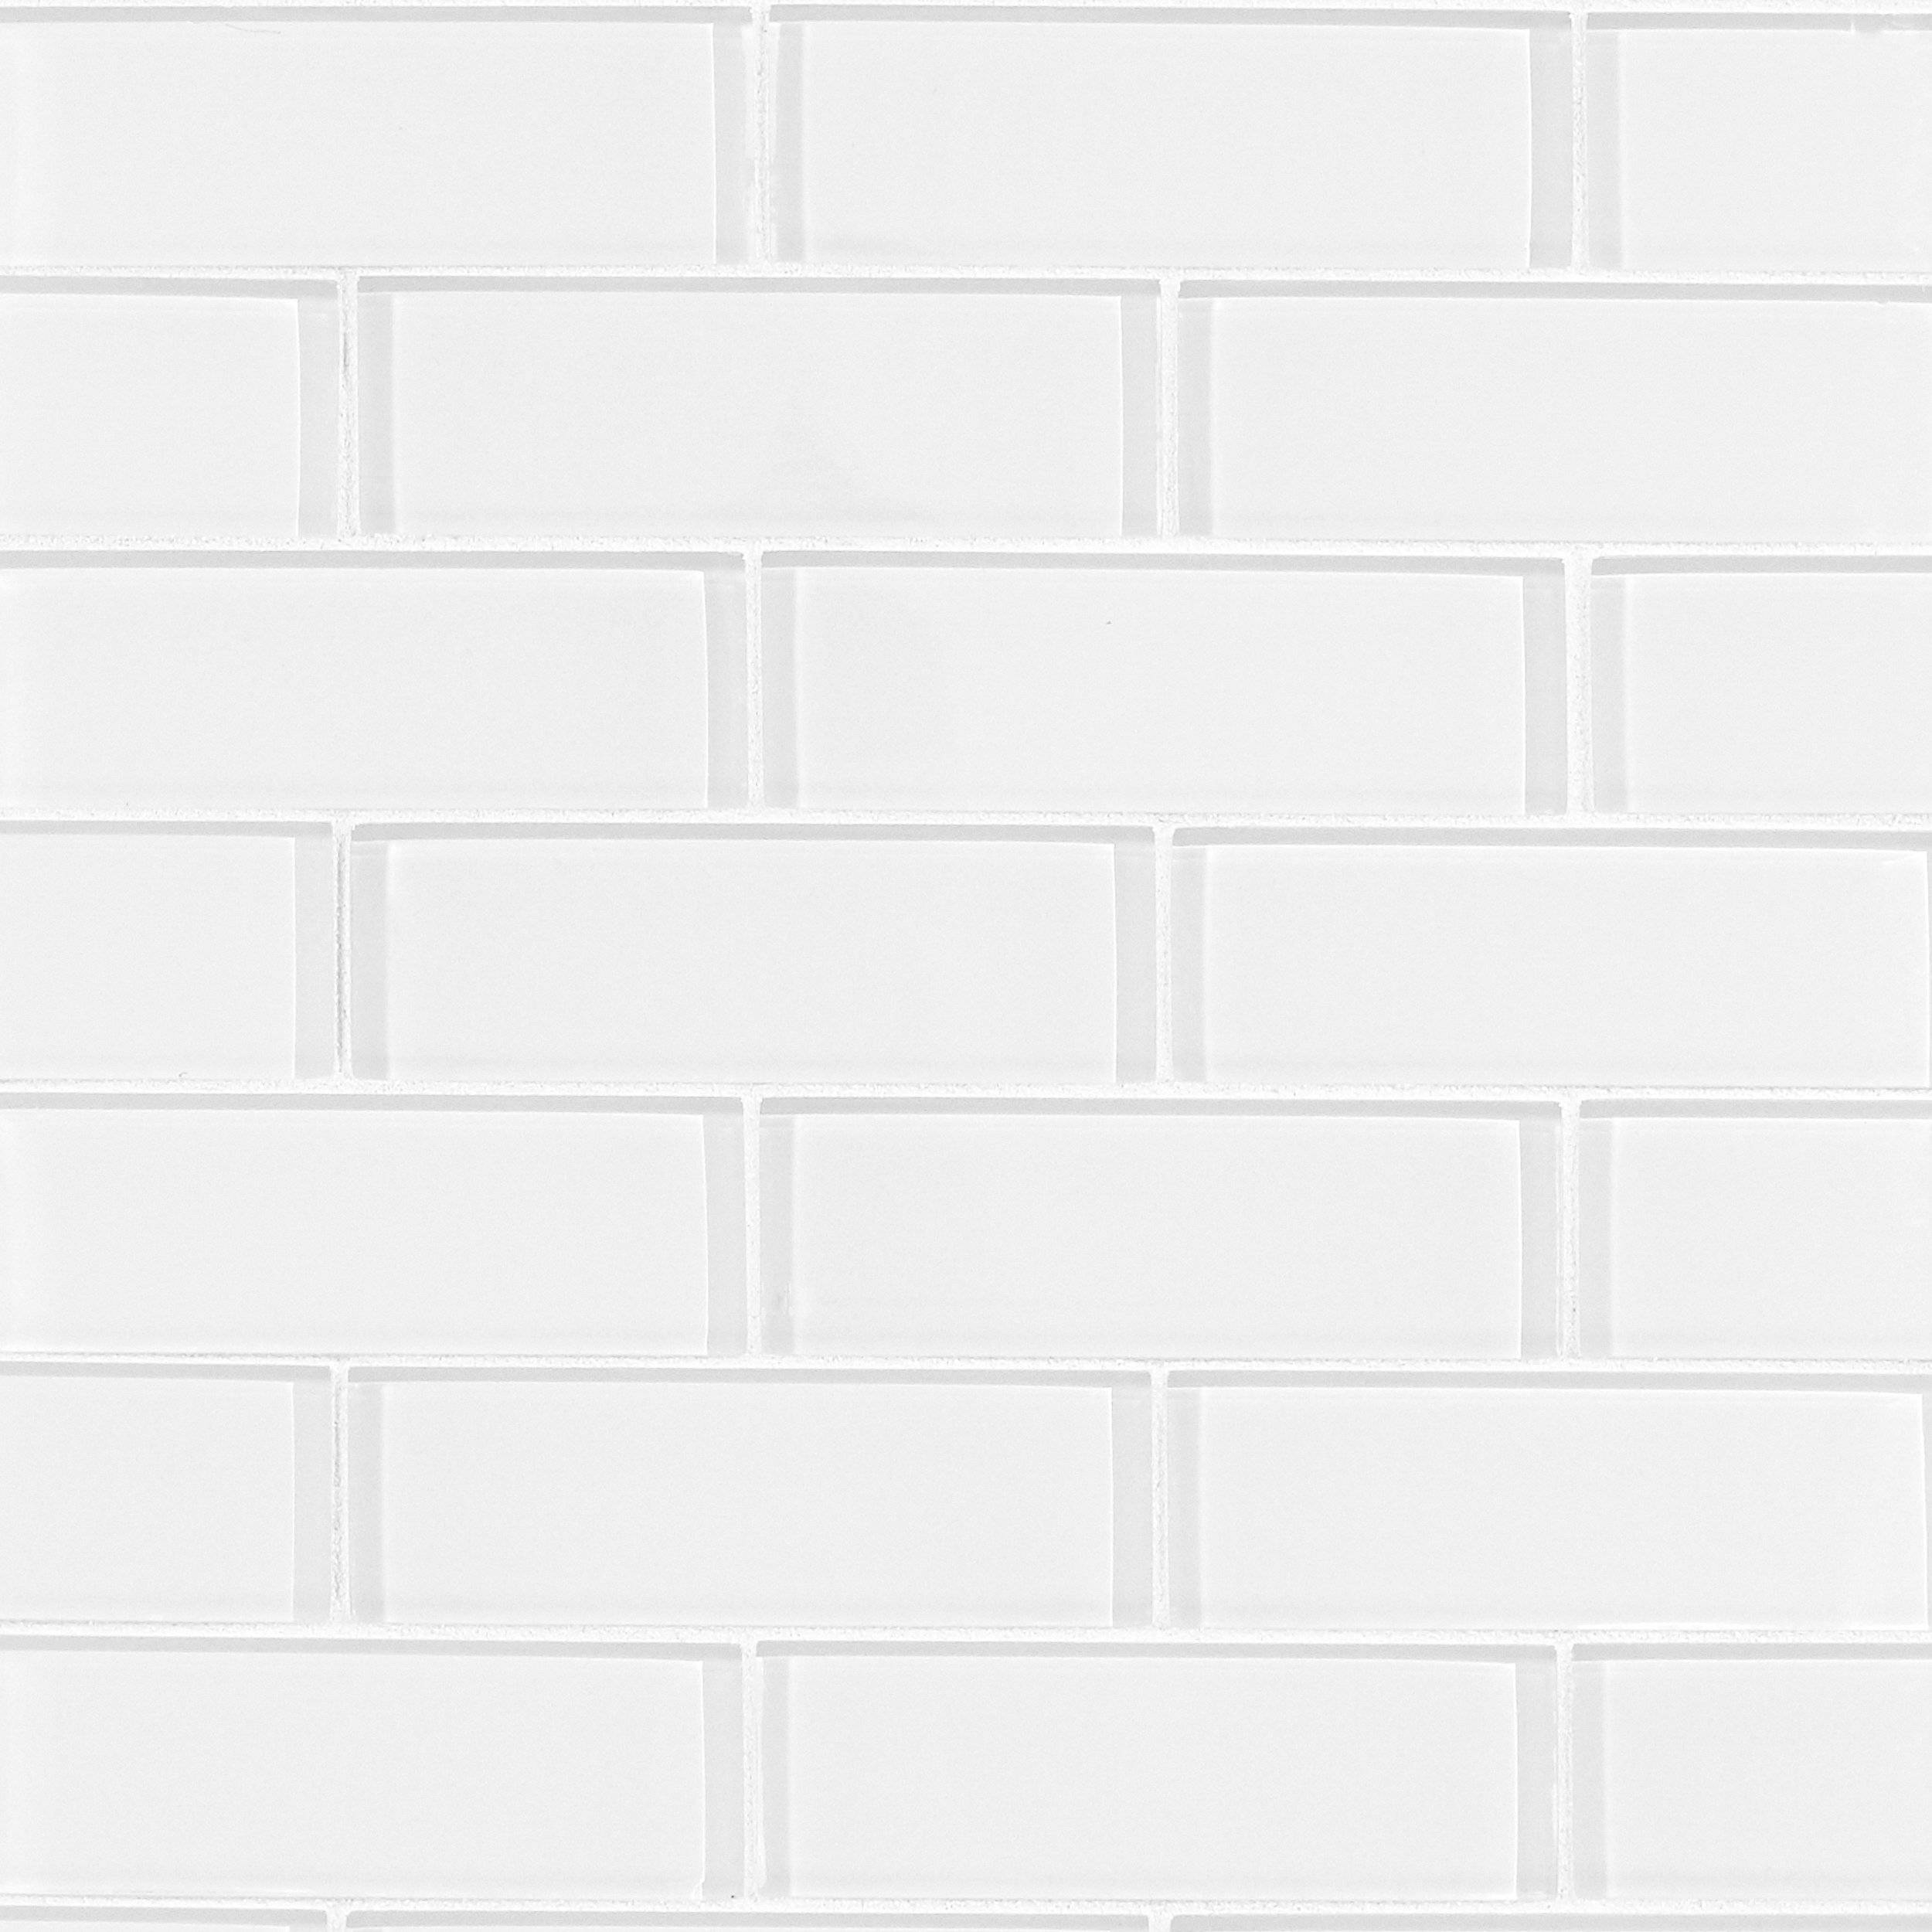 Brick Misty 3 X 6 Polished Porcelain Mosaic 12 X 12 100840040 Floor And Decor